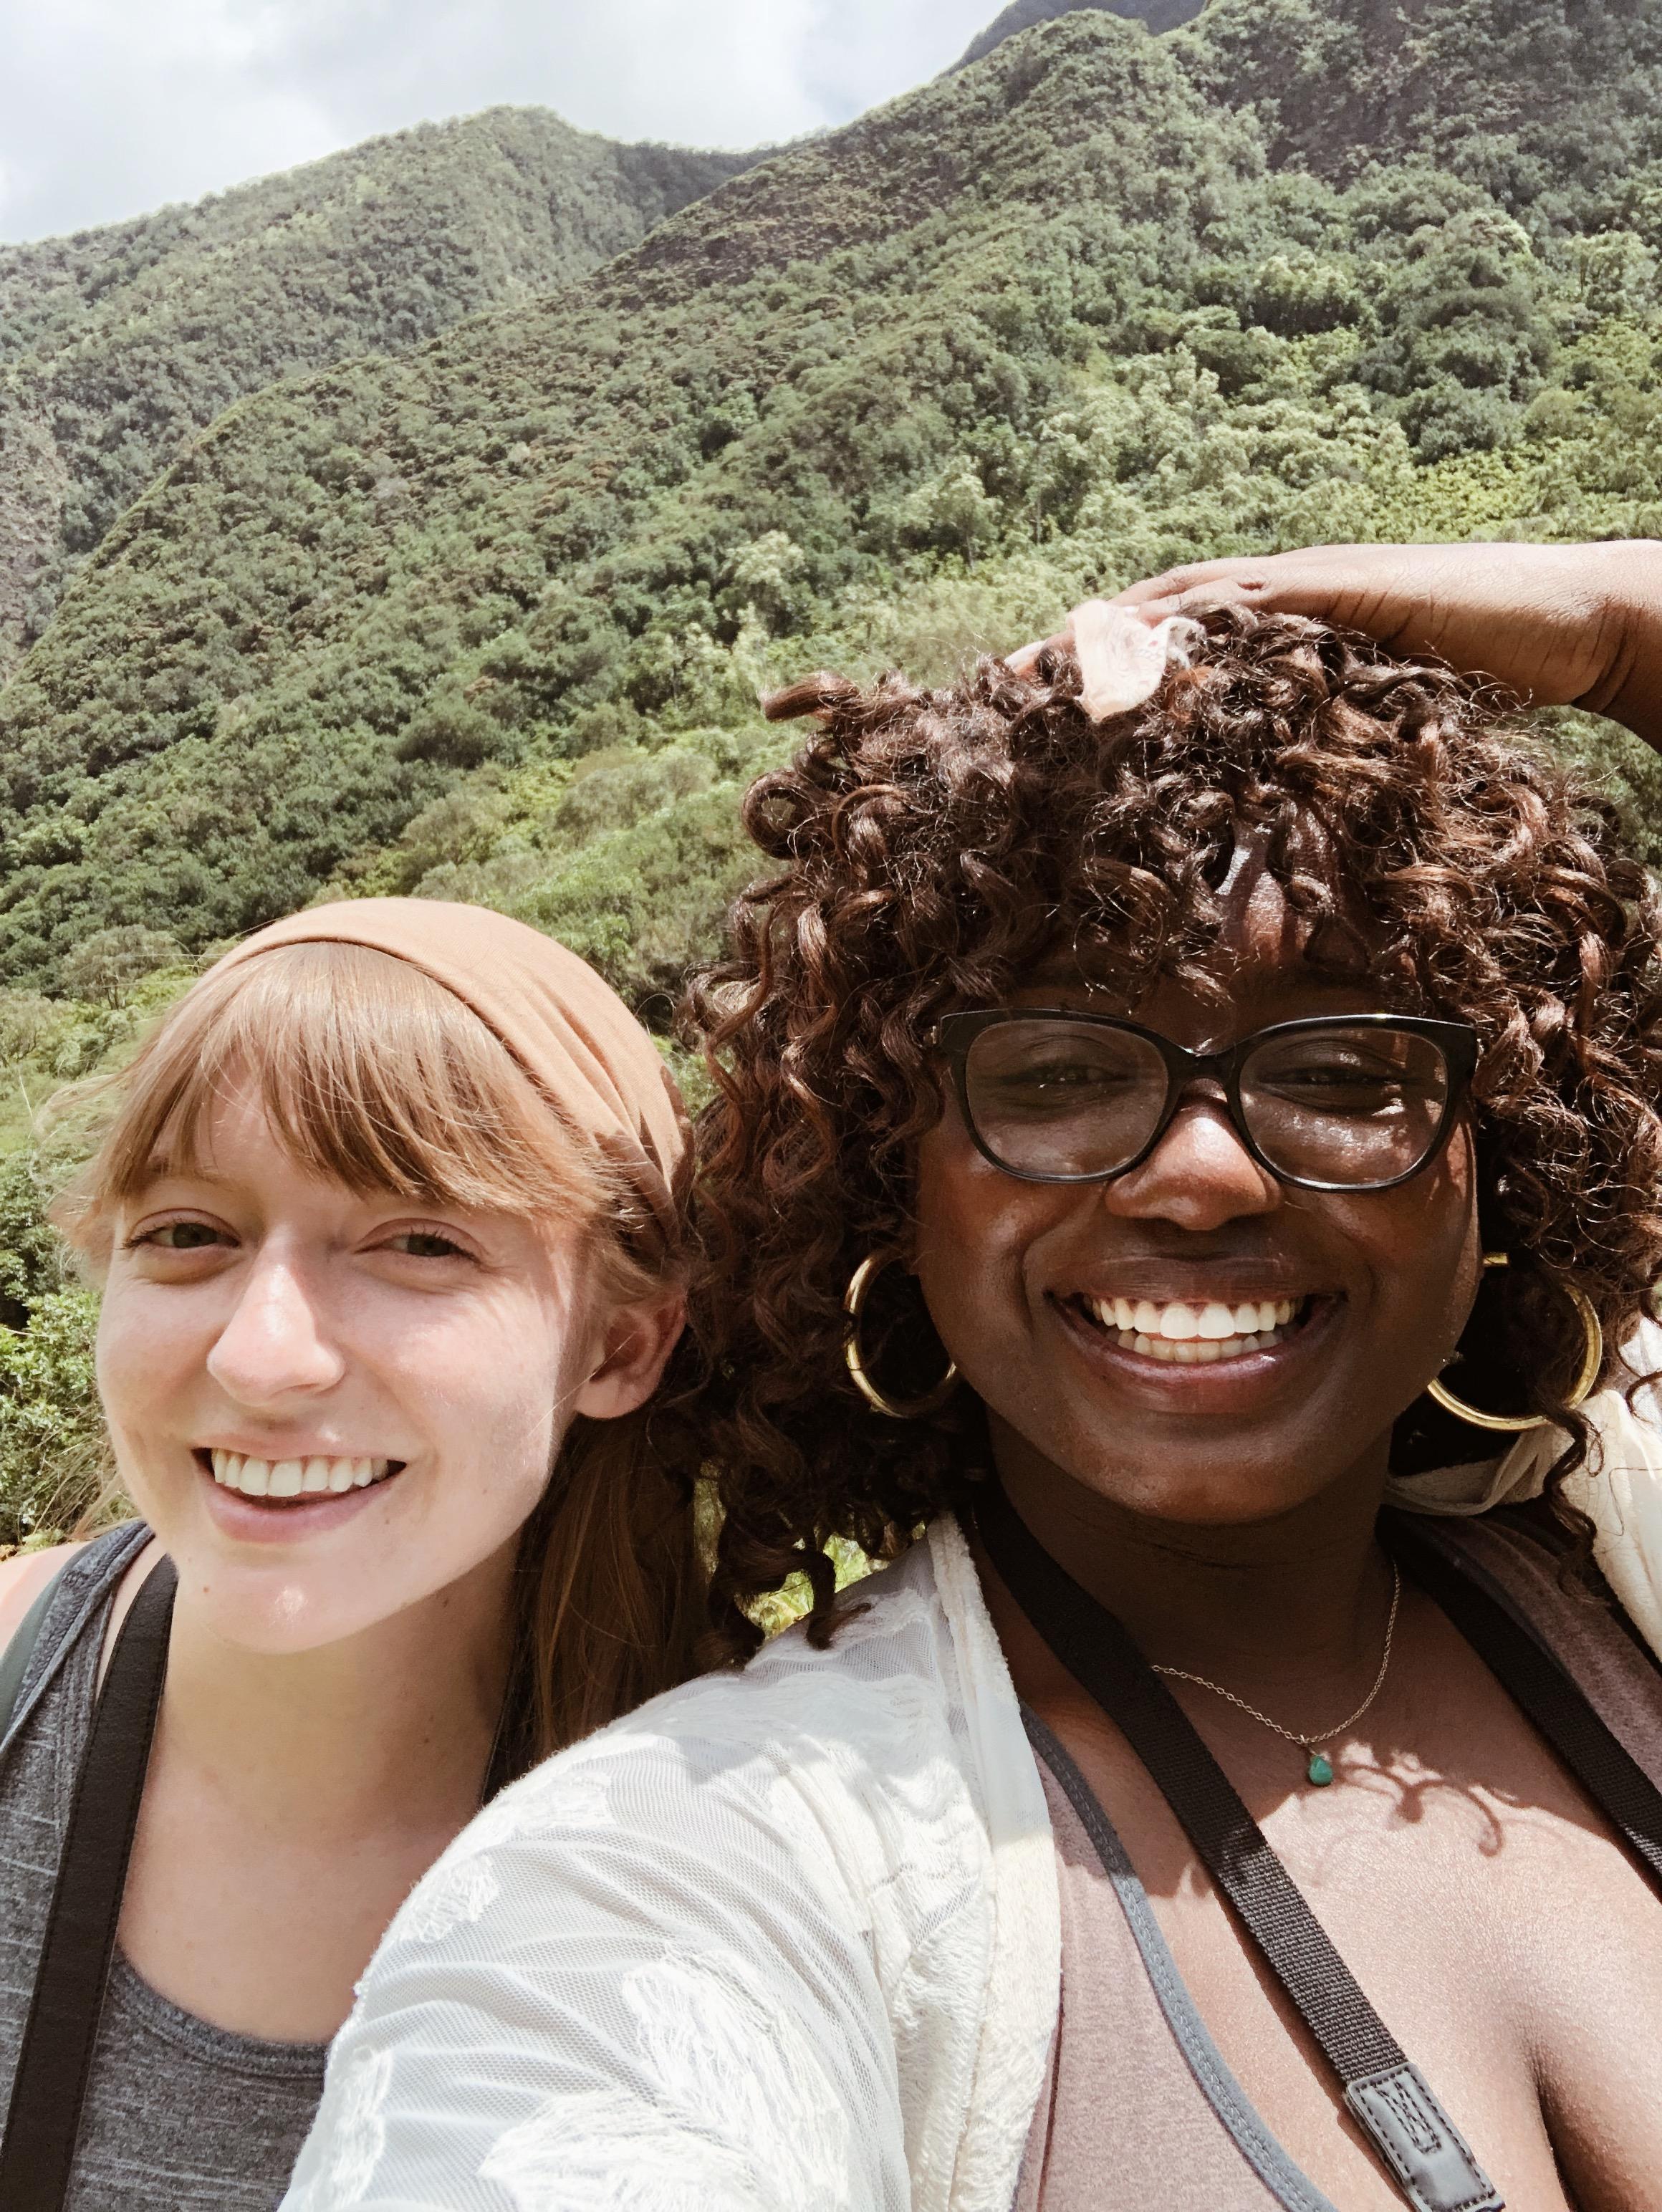 My travel buddy and bestie Brittany!